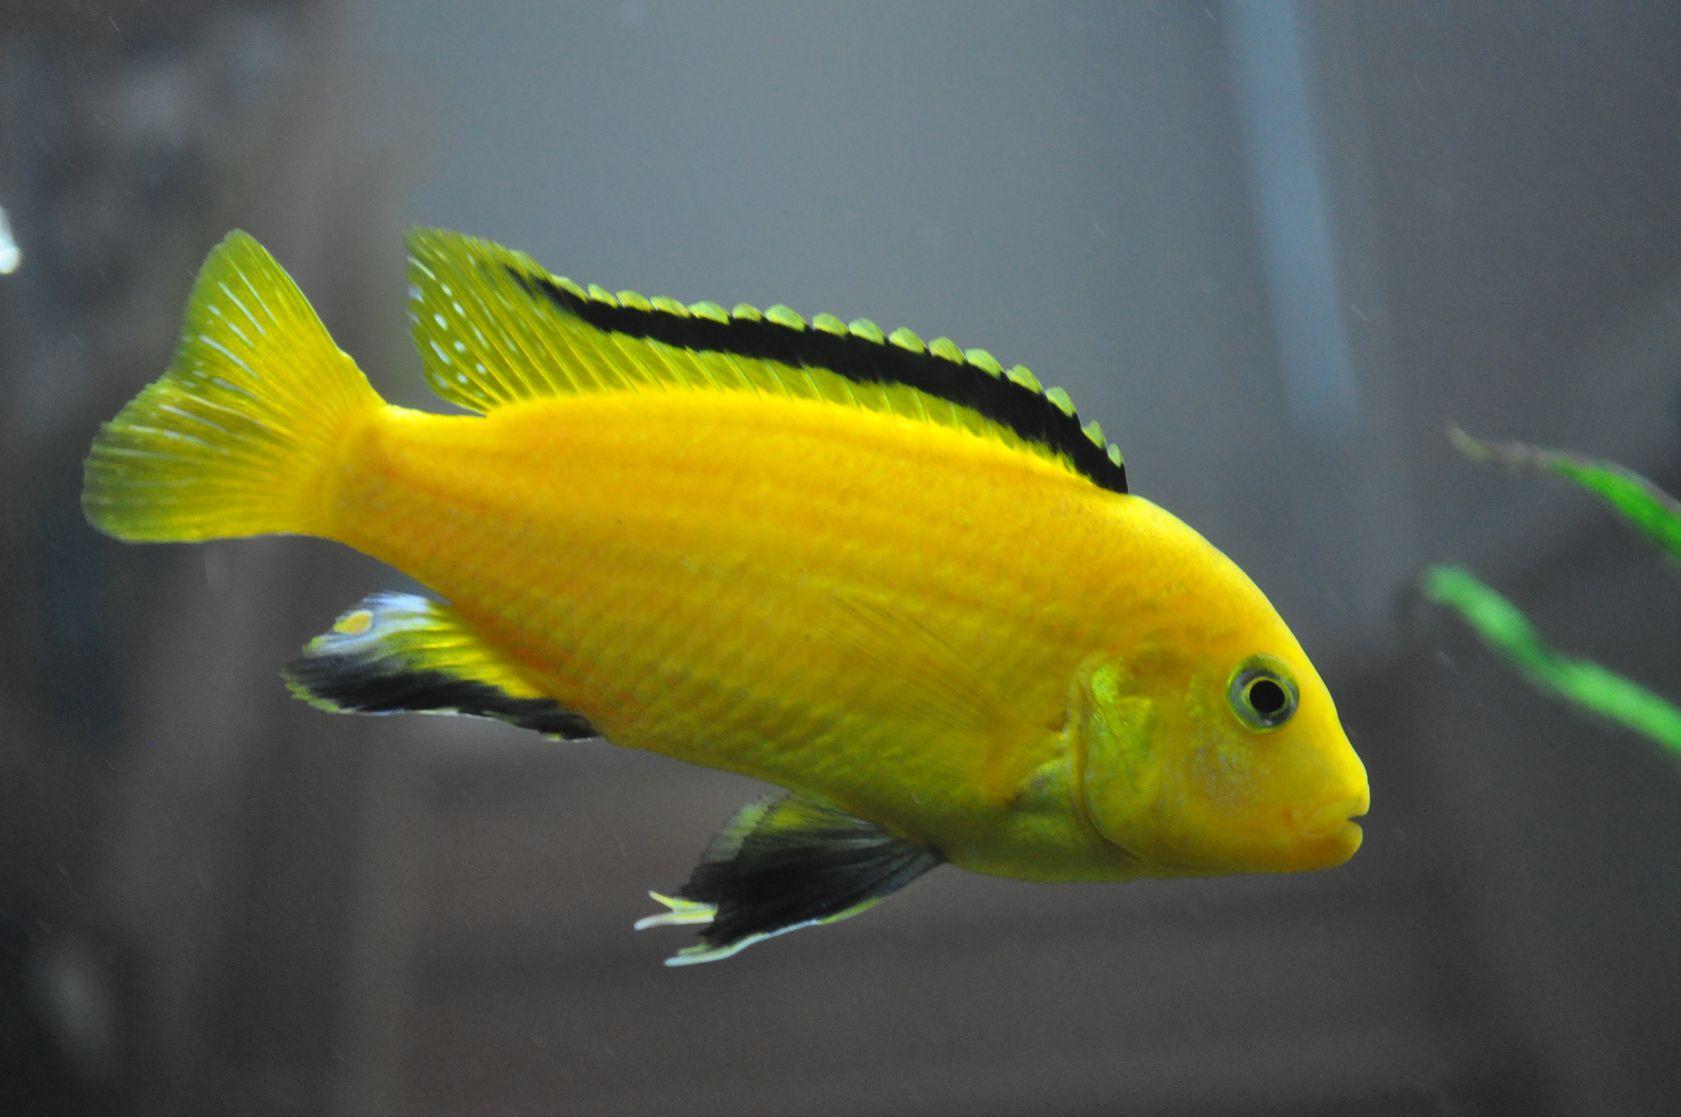 A Labidochromis Caeruleus Or Electric Yellow Cichlid This Is One Of The Most Popular Species Of Mbuna From Lake Malawi Cichlids Aquarium Fish Cichlid Aquarium